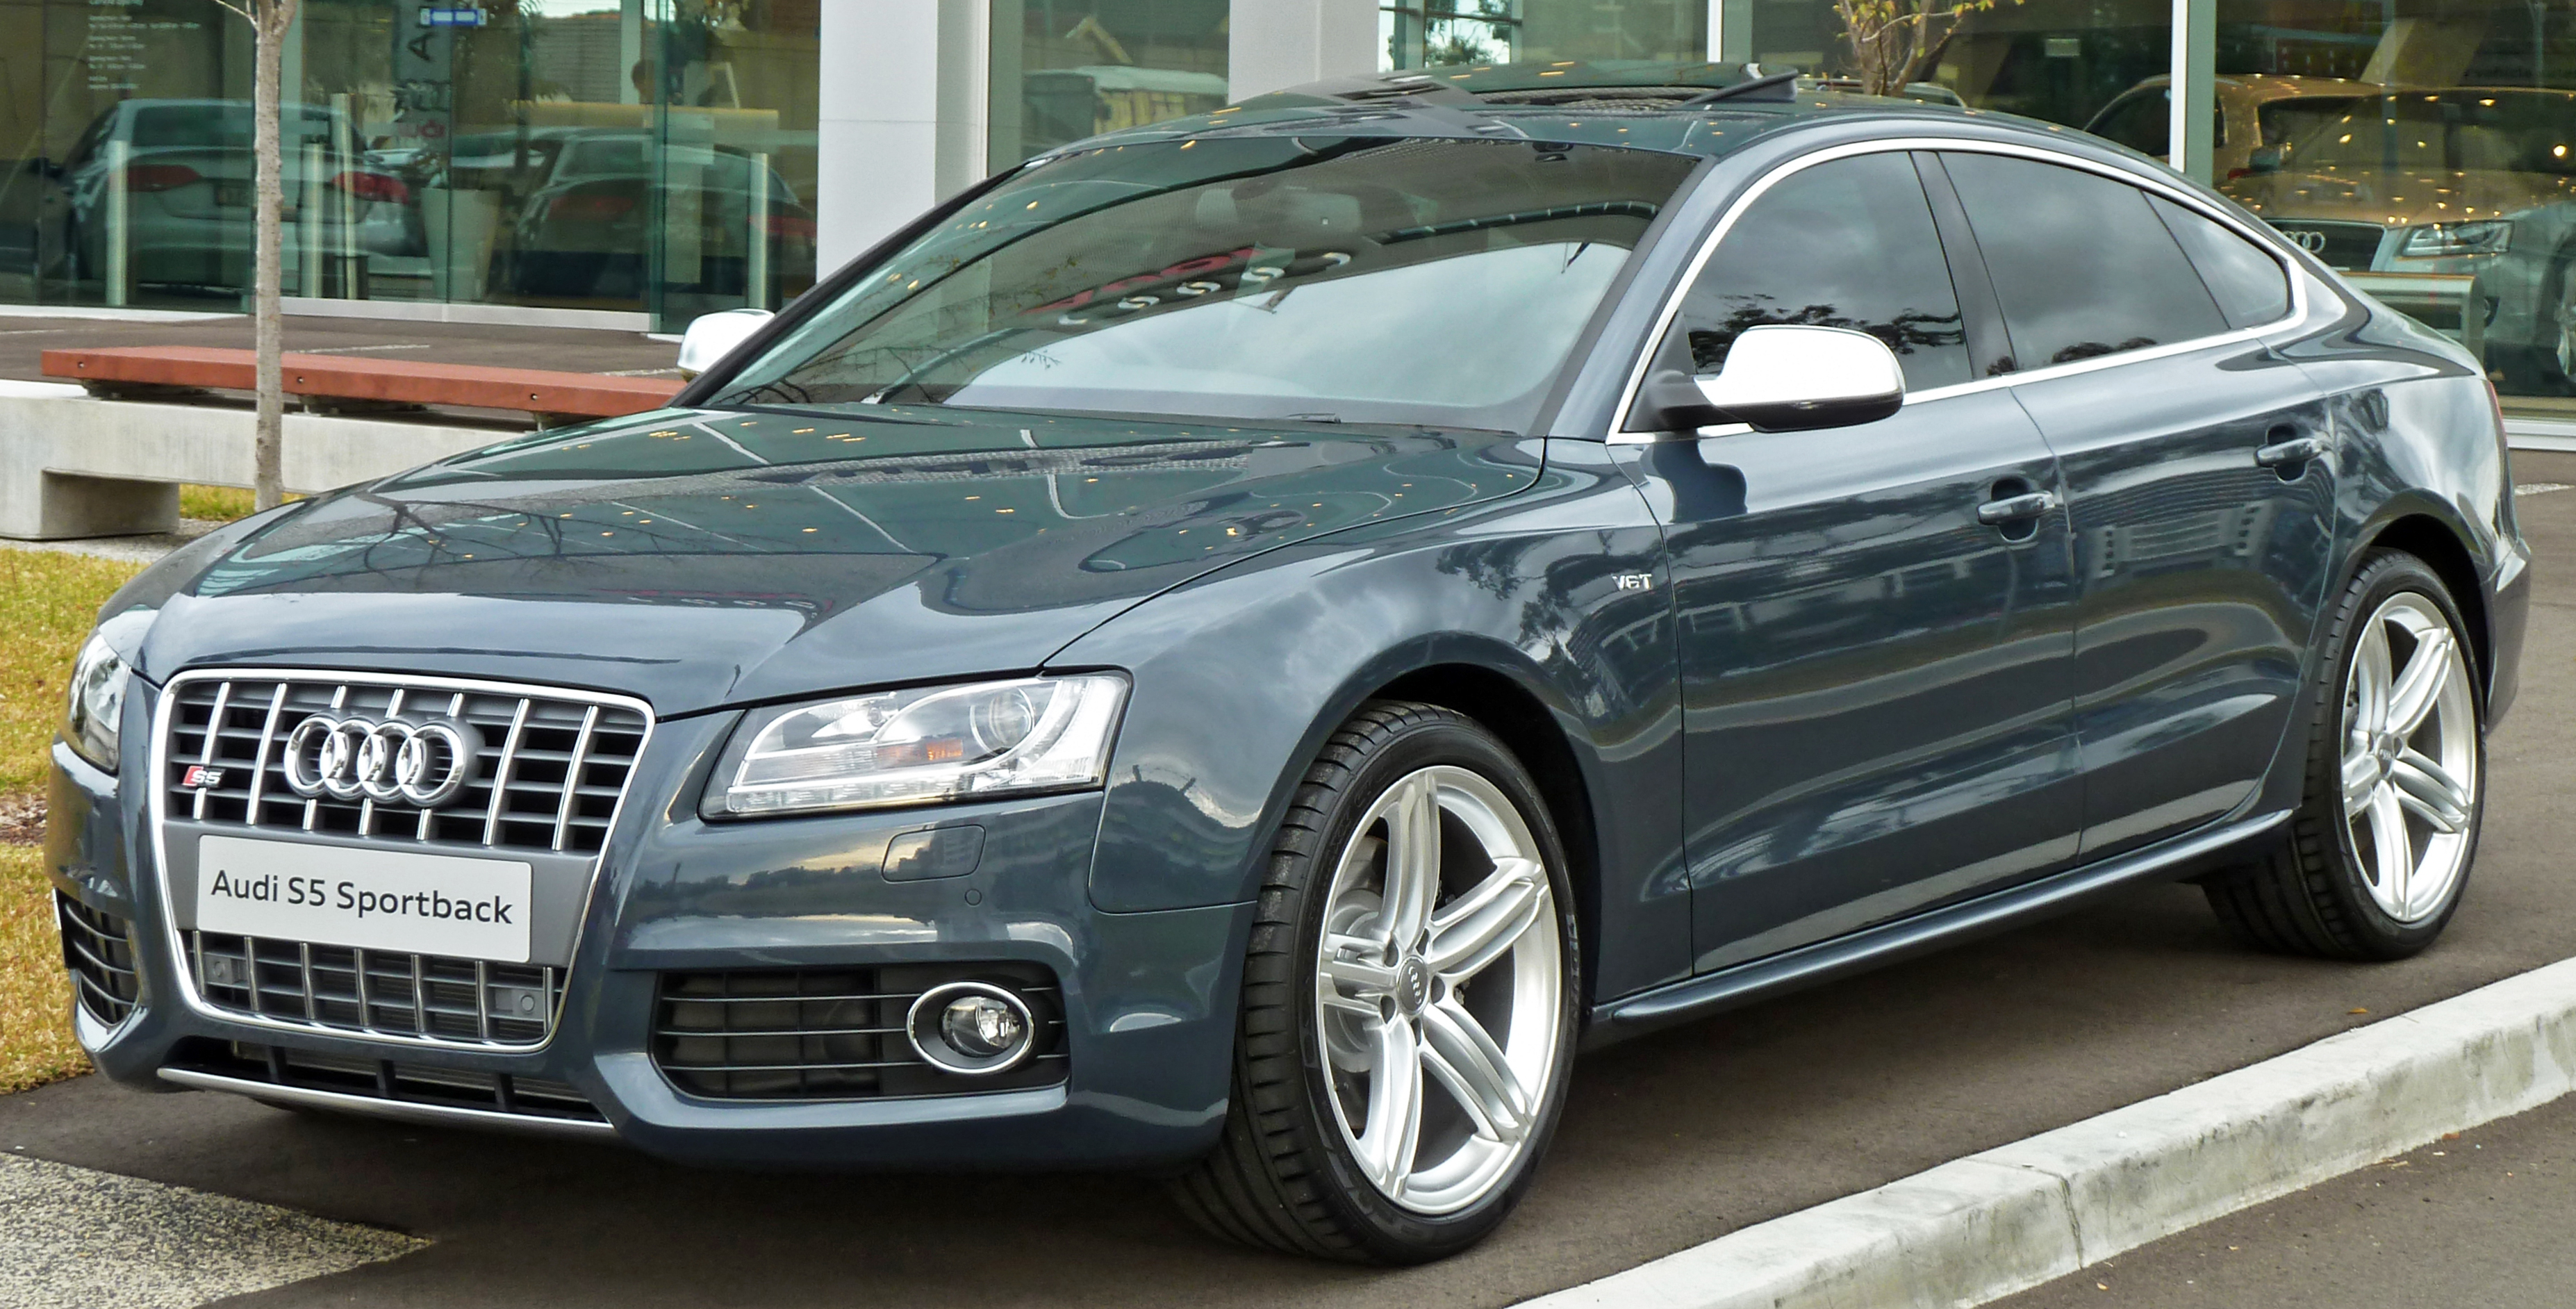 File 2010 Audi S5 8t Sportback 01 Jpg Wikimedia Commons